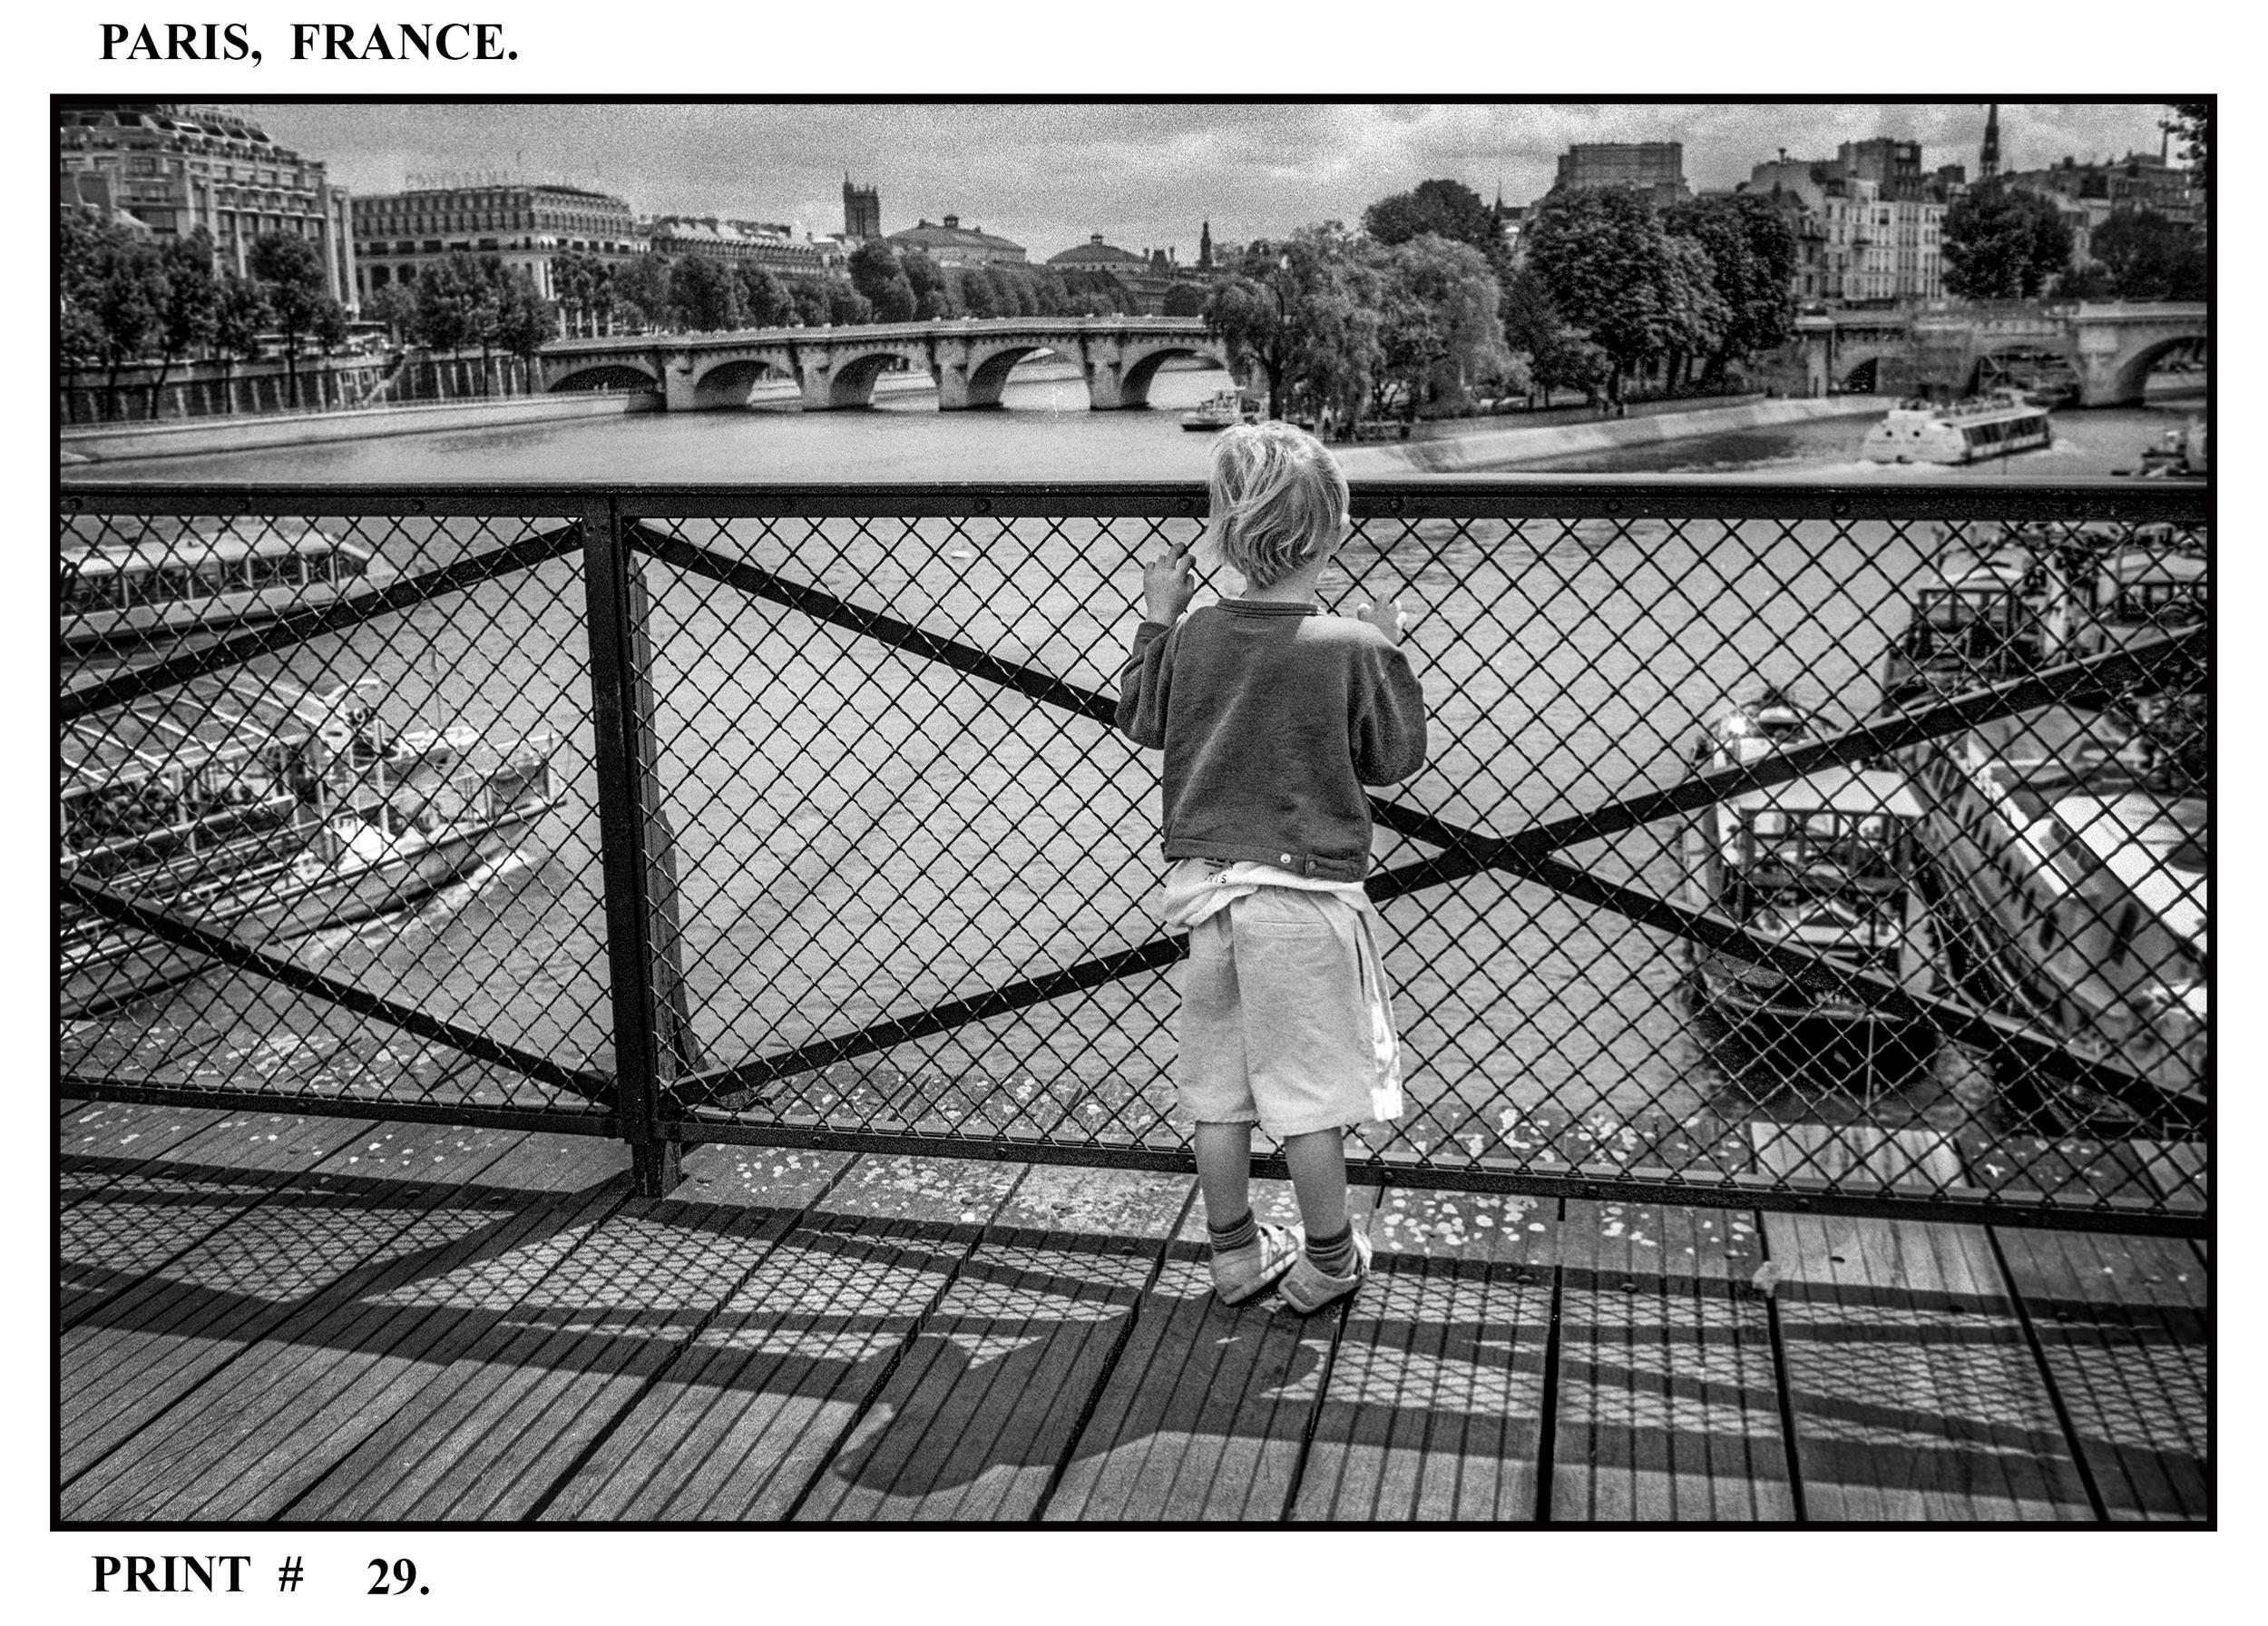 029PARIS, FRANCE copy.jpg